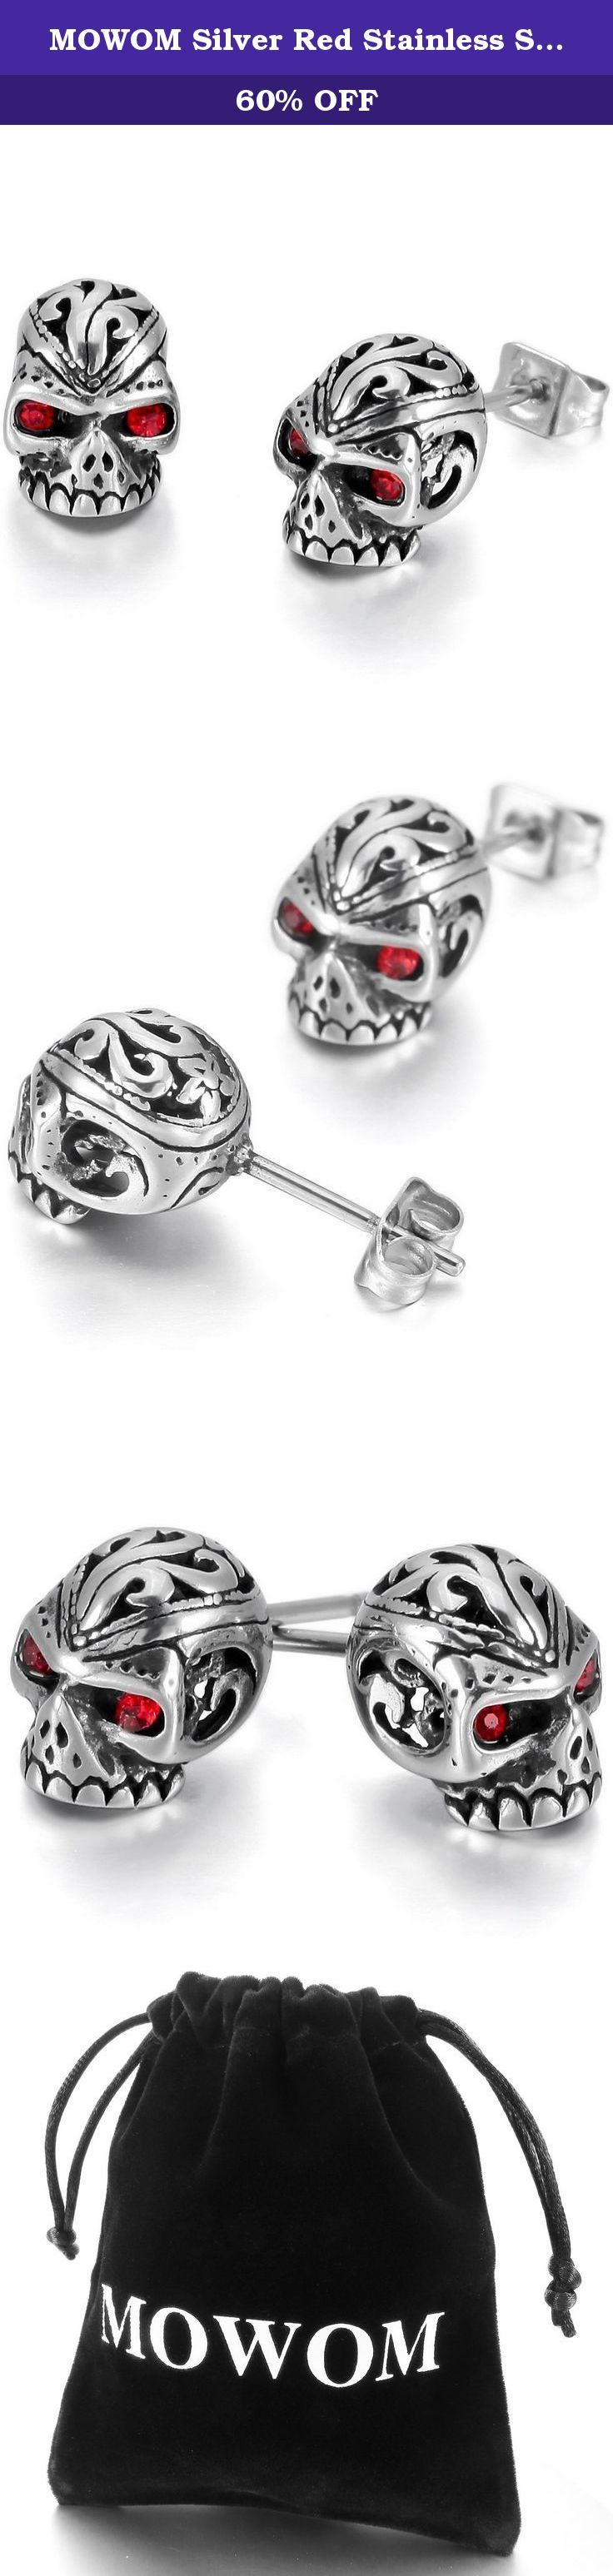 MOWOM Silver Red Stainless Steel Stud Earrings CZ Skull. Silver Red Stainless Steel Stud Earrings CZ Skull.